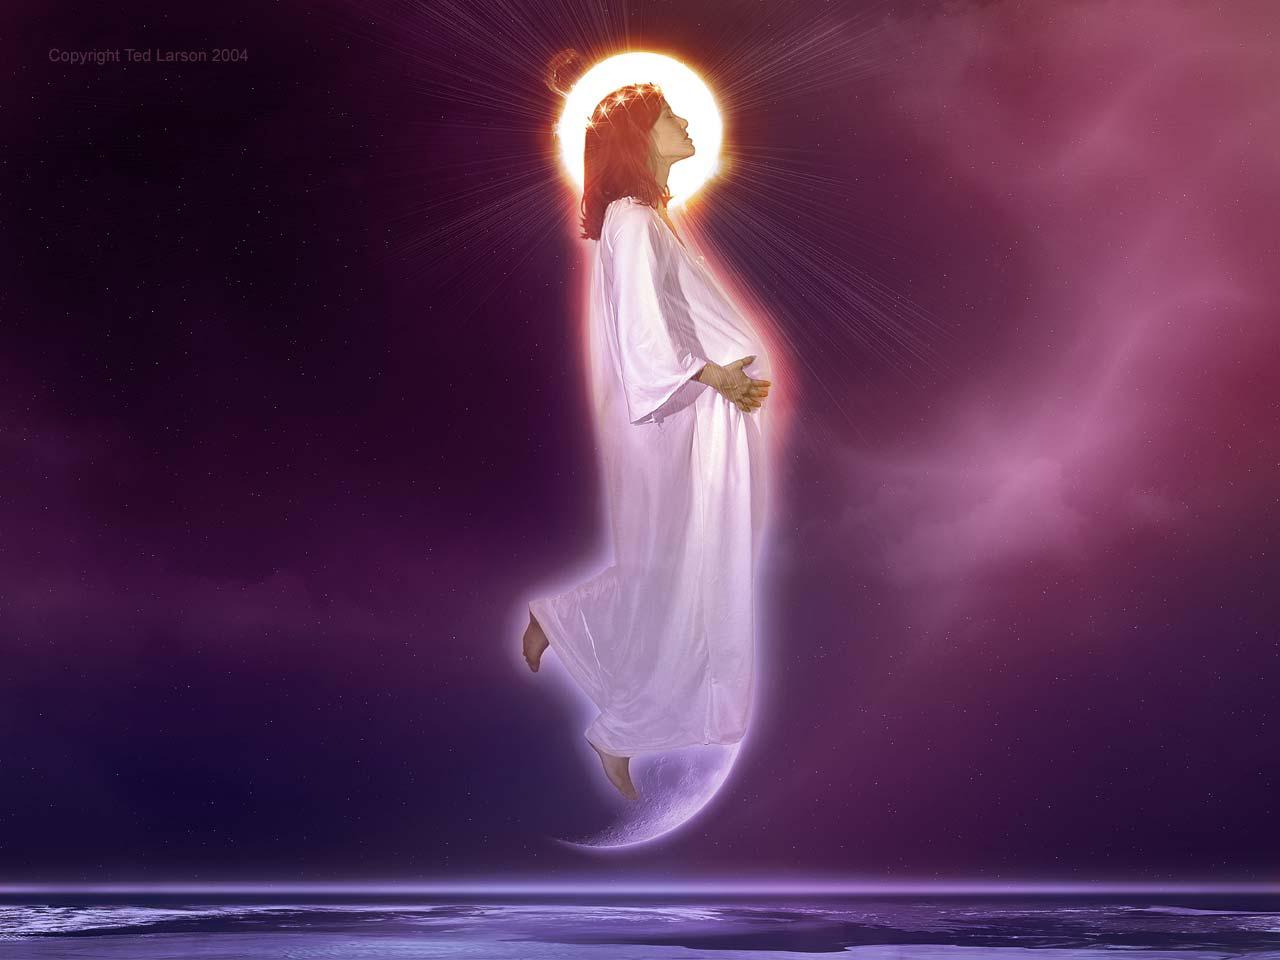 Woman-Pregnant-12-Stars-Moon-Birth-Revelation-12.jpg